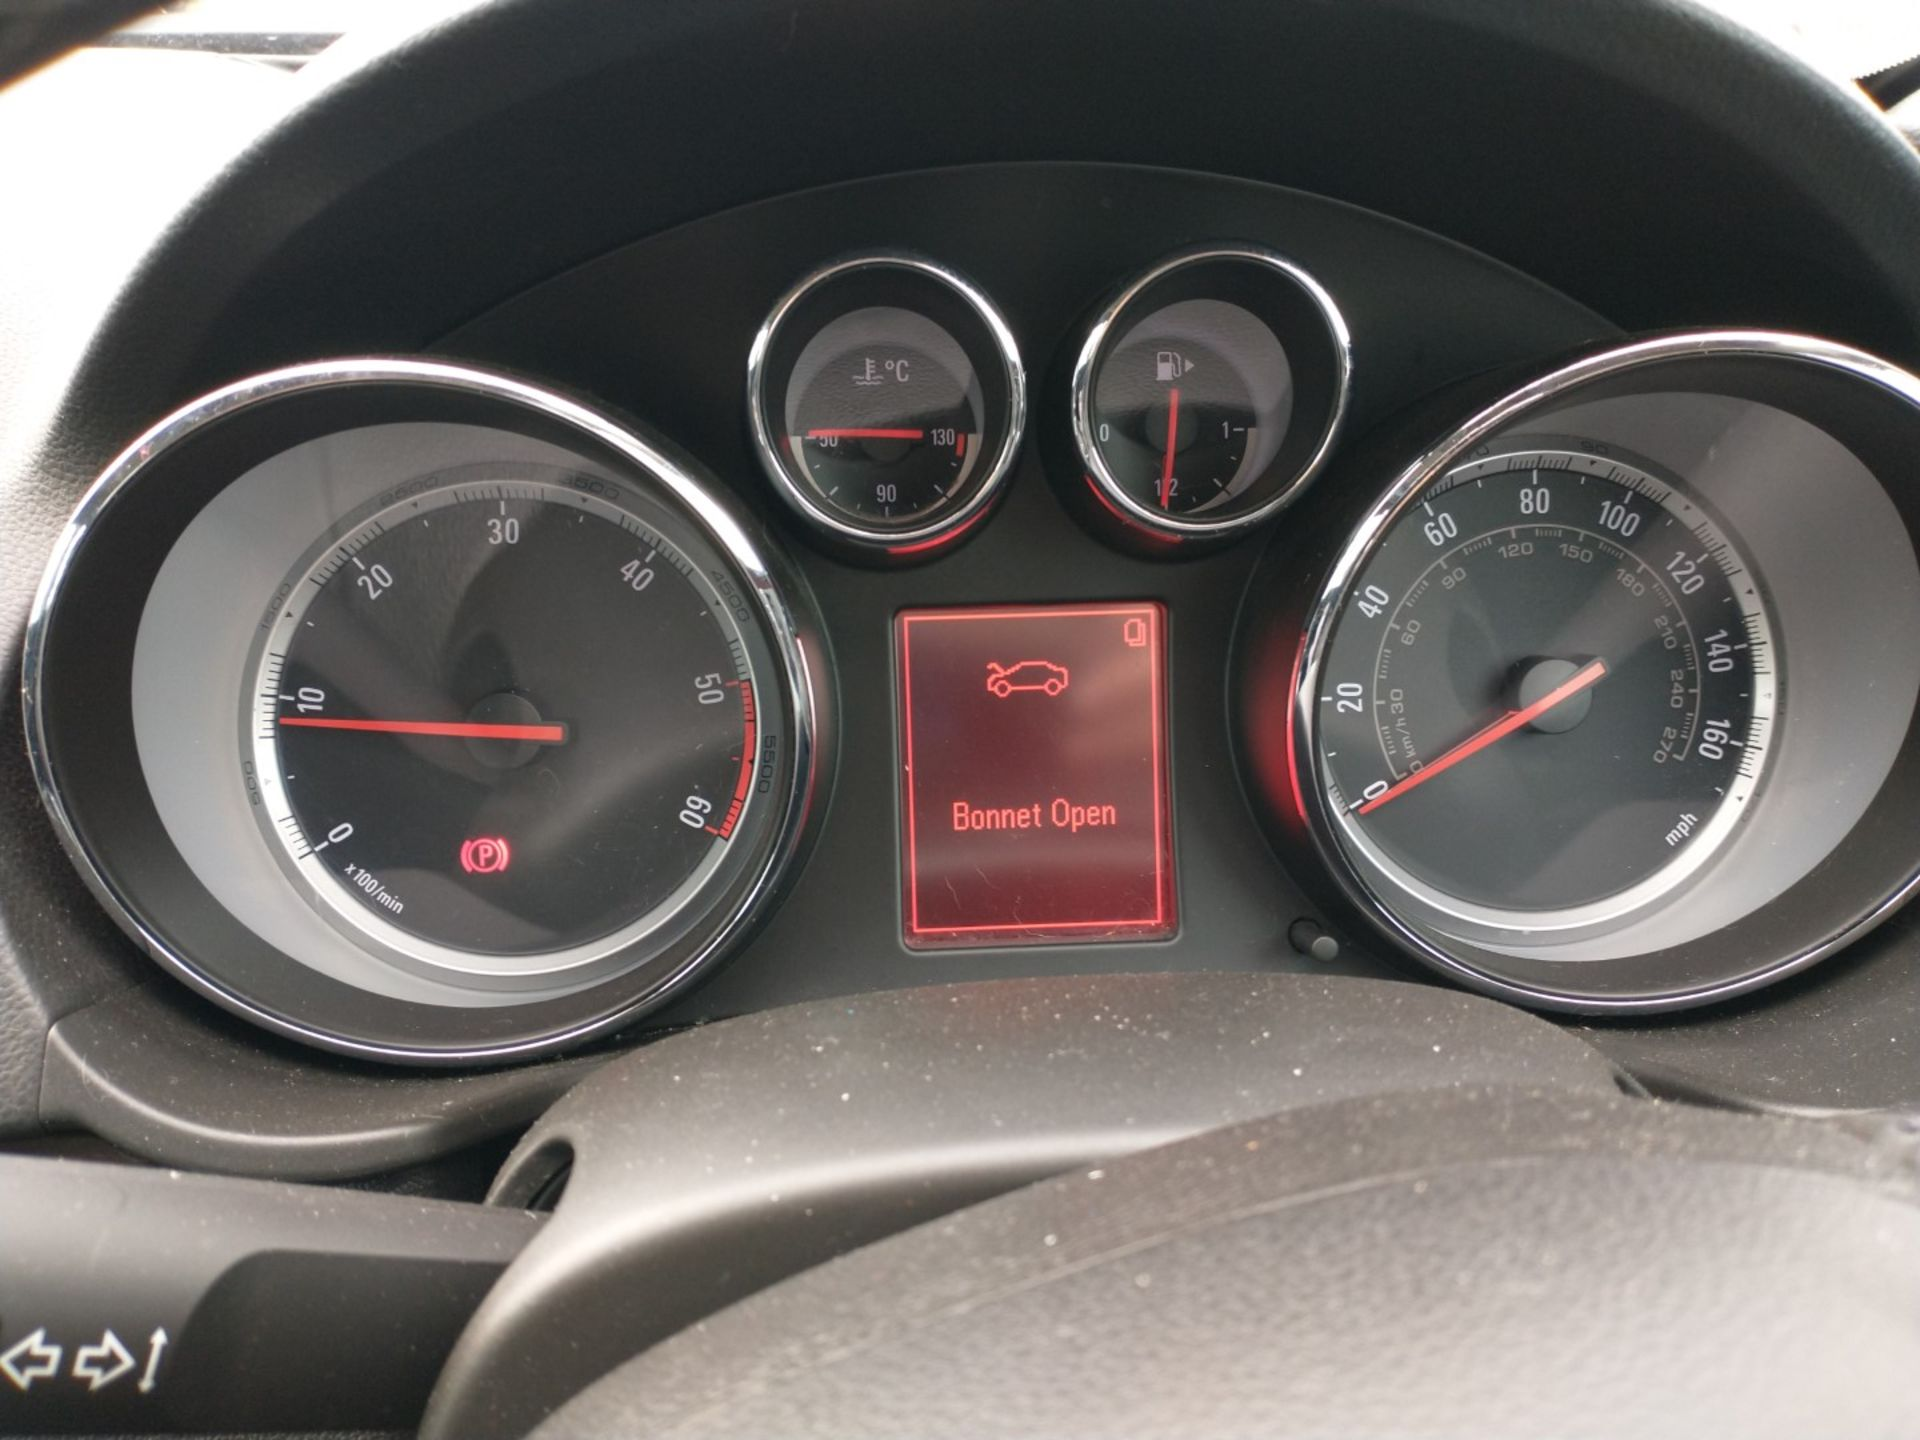 2009 Vauxhall Insignia Elite Nav CDTI 5dr 2.0 Diesel - CL505 - NO VAT ON THE HAMMER - Location: Corb - Image 9 of 22